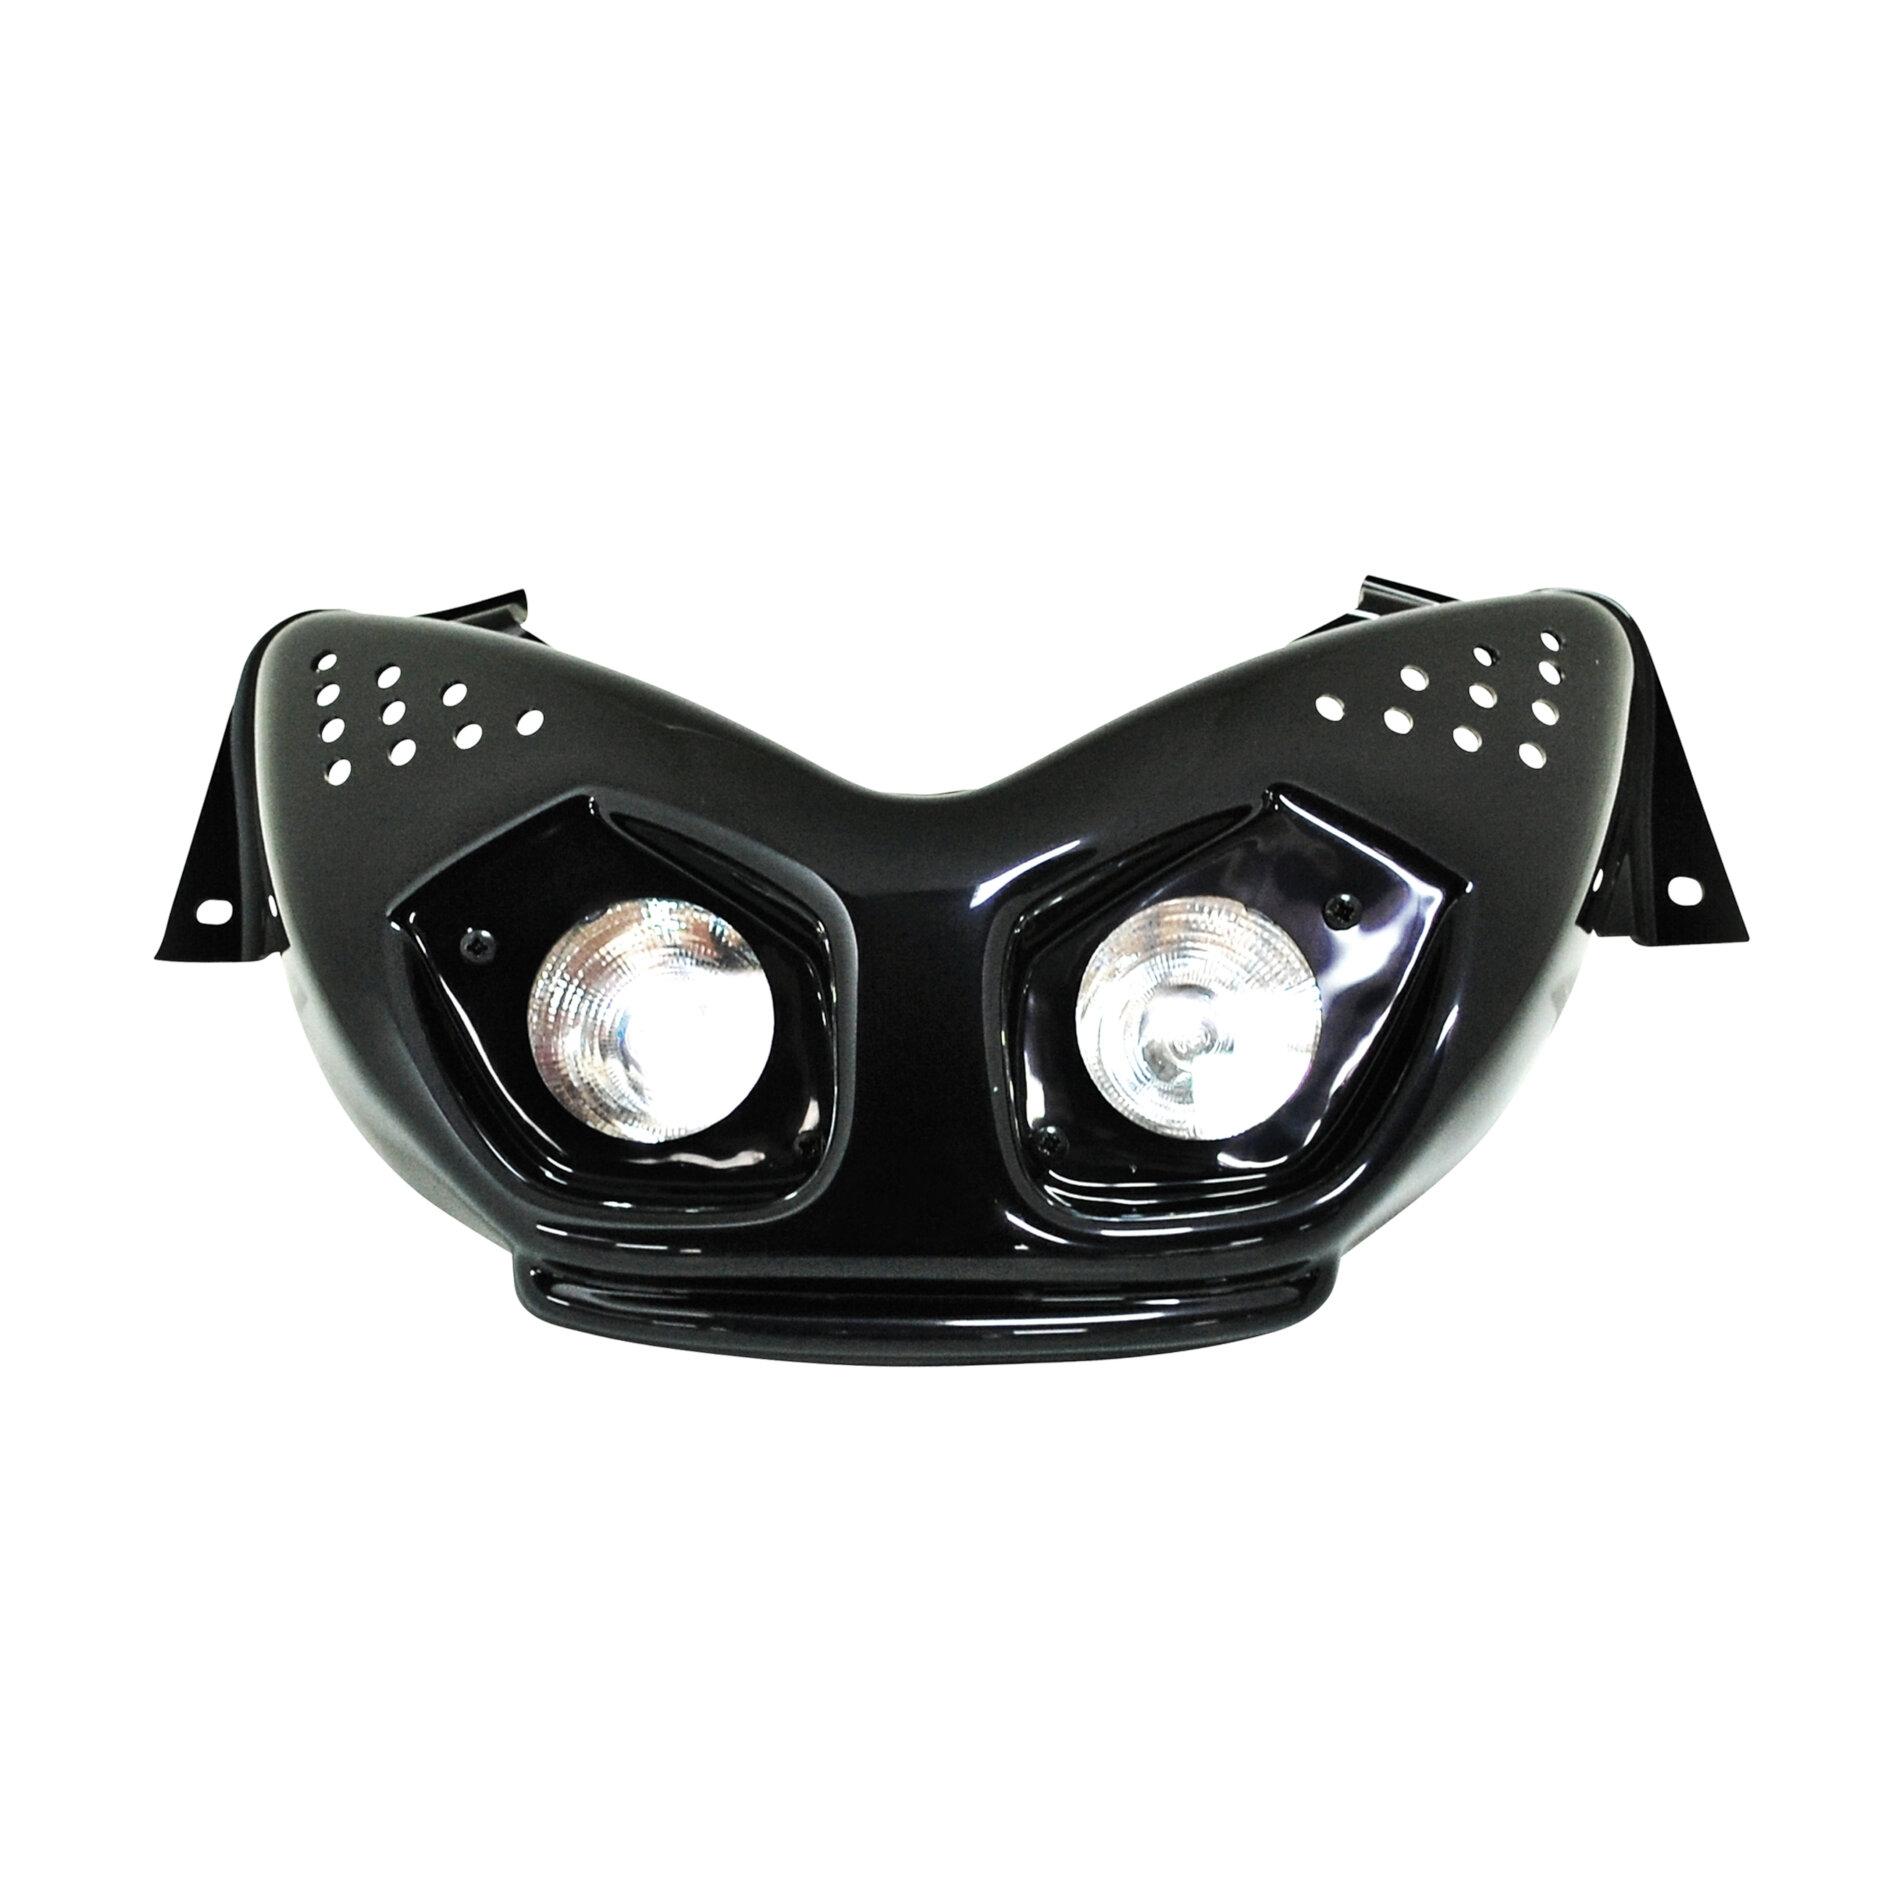 Double optique halogène BCD MBK Nitro / Yamaha Aerox - Blanc